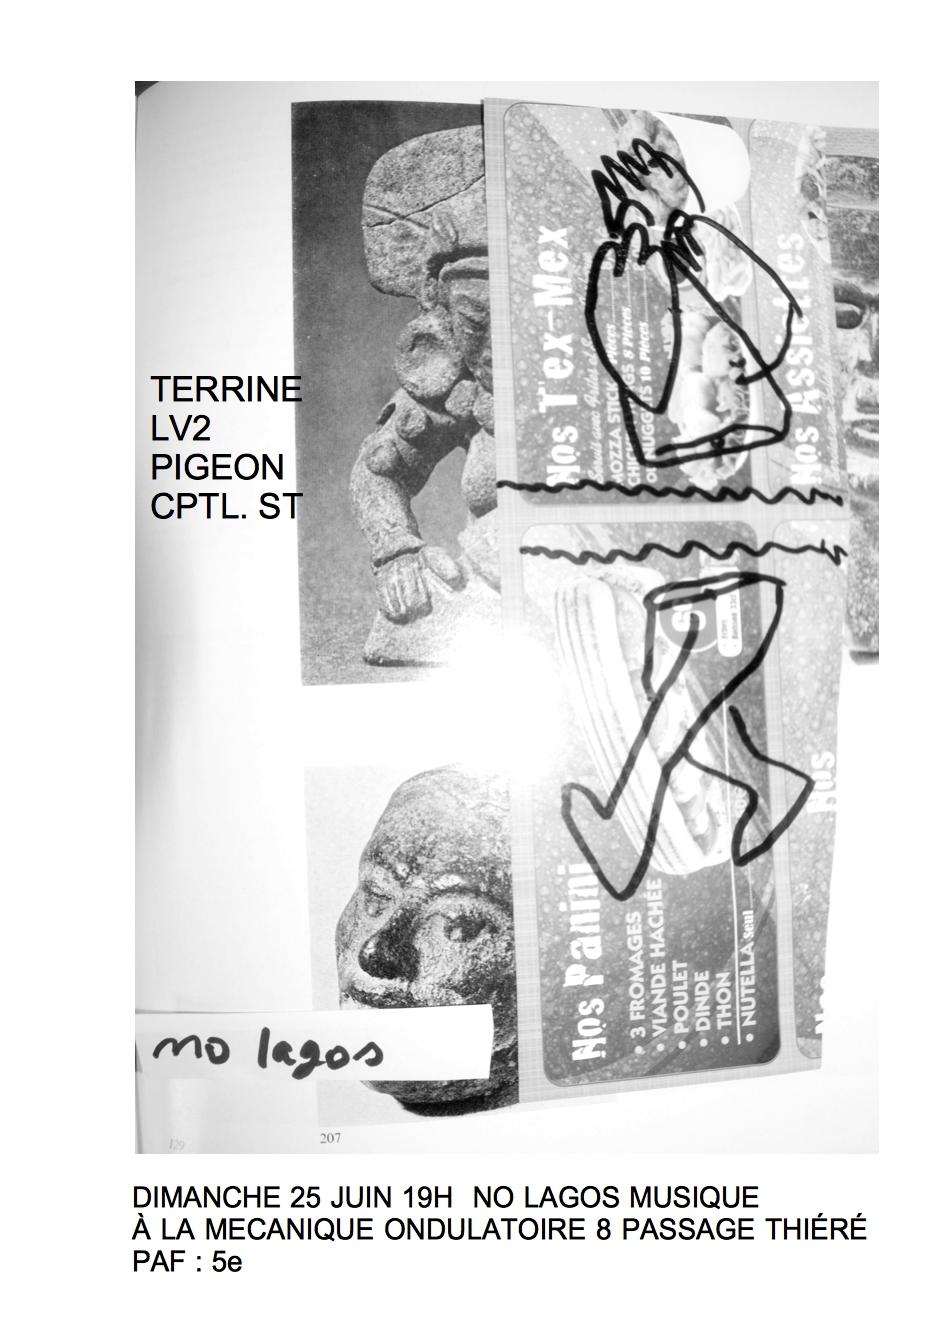 NO LAGOS MUSIC // 25.06